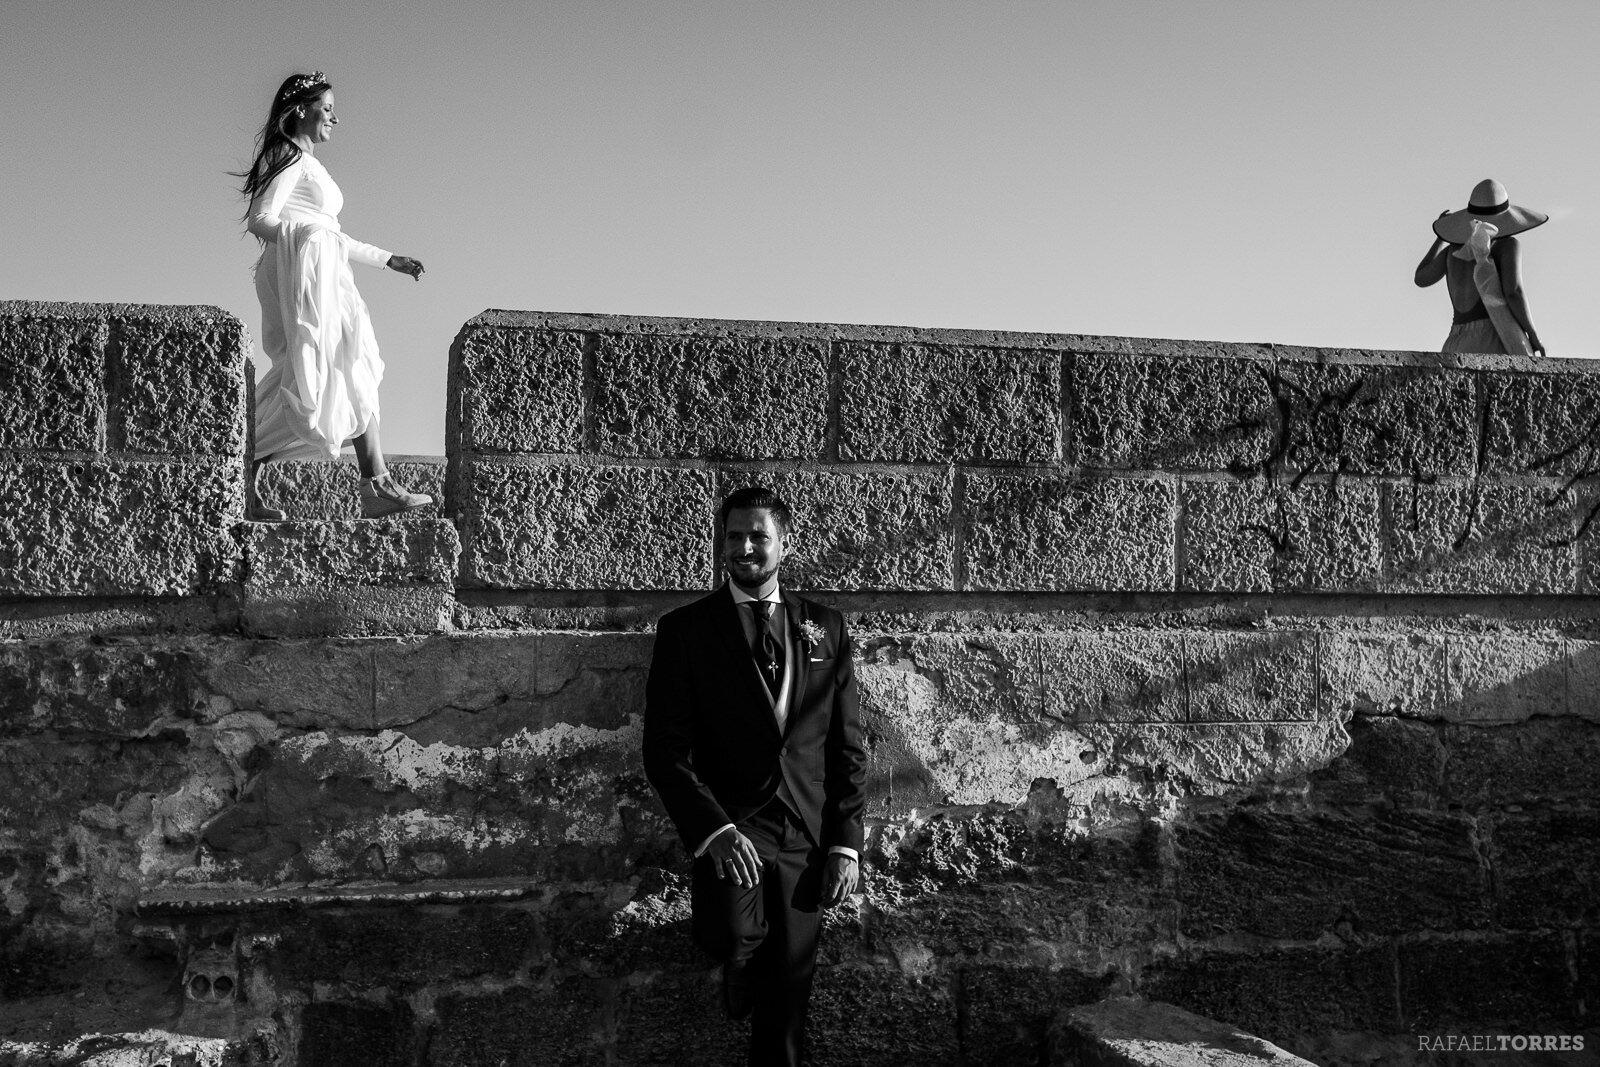 postboda-cadiz-fotografo-boda-diferente-wedding-137.jpg